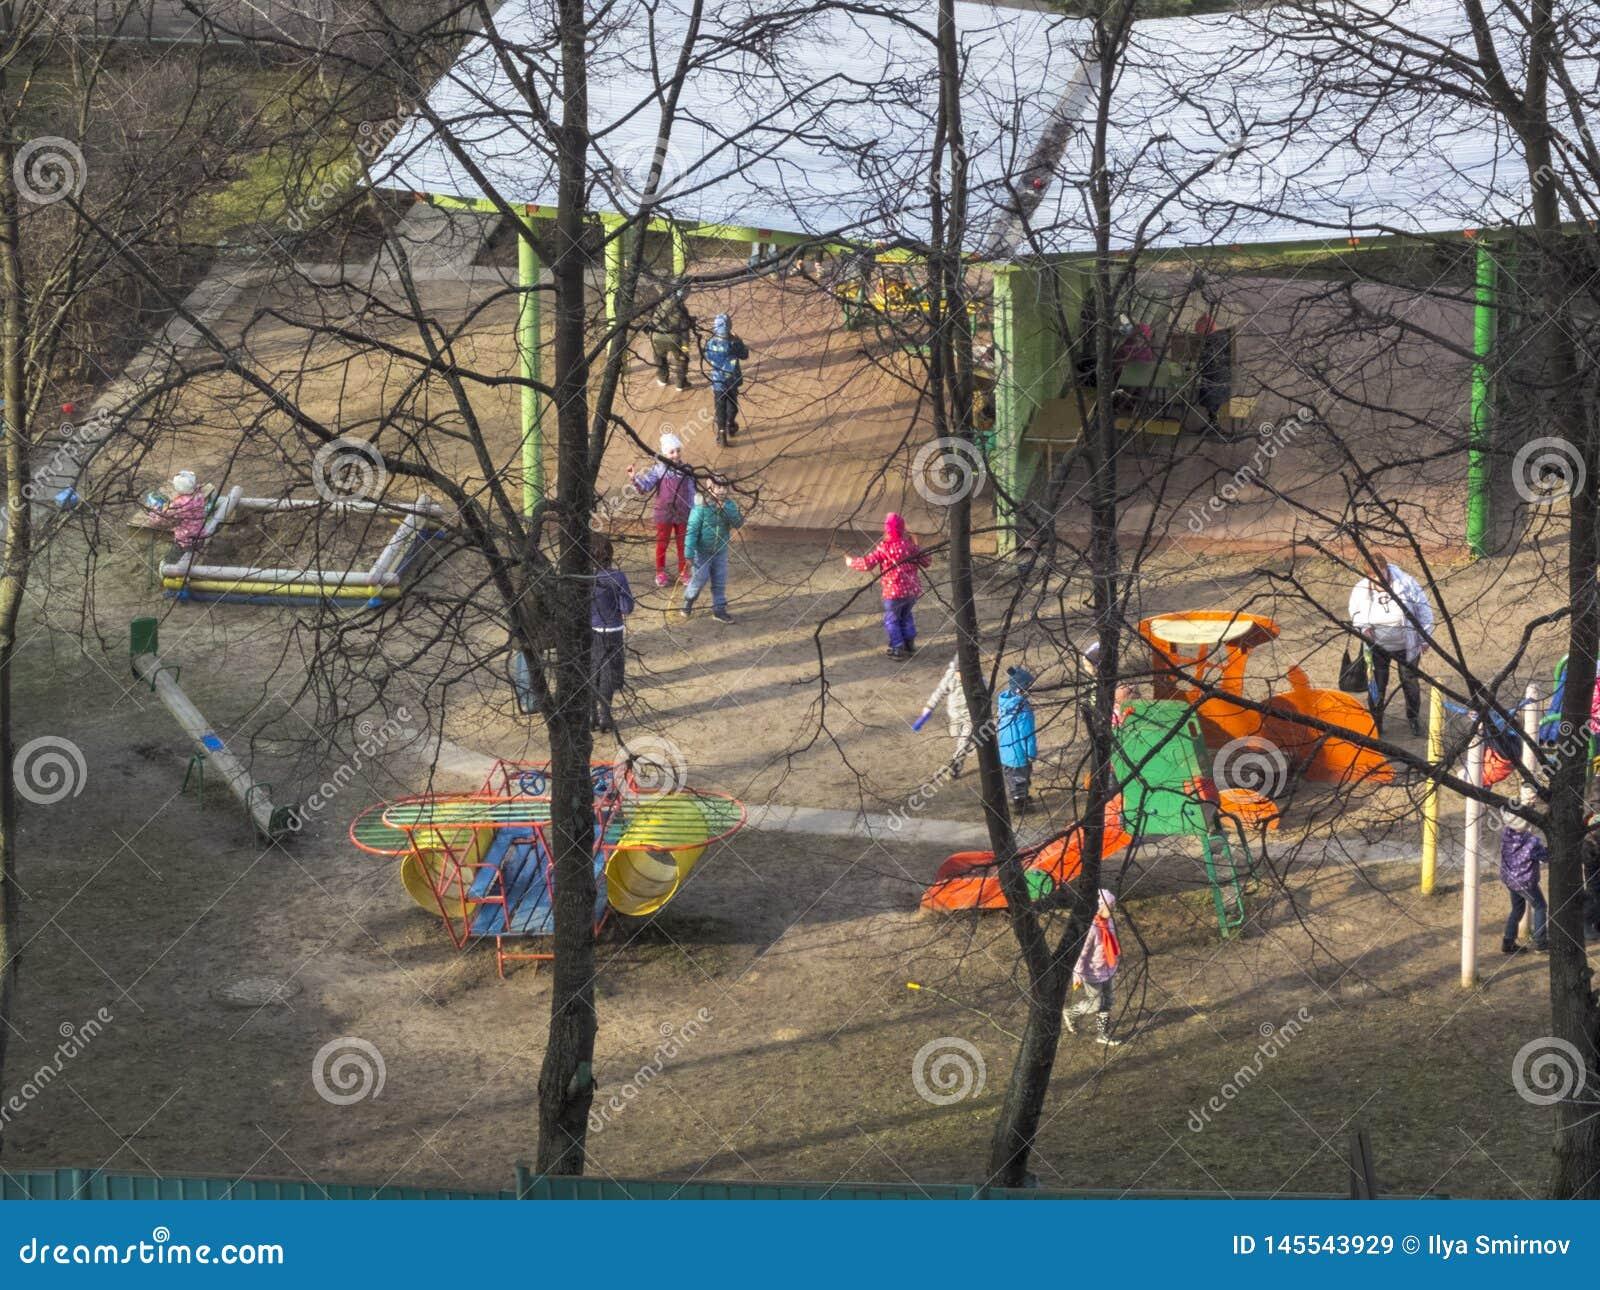 E Ο ήλιος λάμπει Τα παιδιά παίζουν στο ναυπηγείο kindergarten